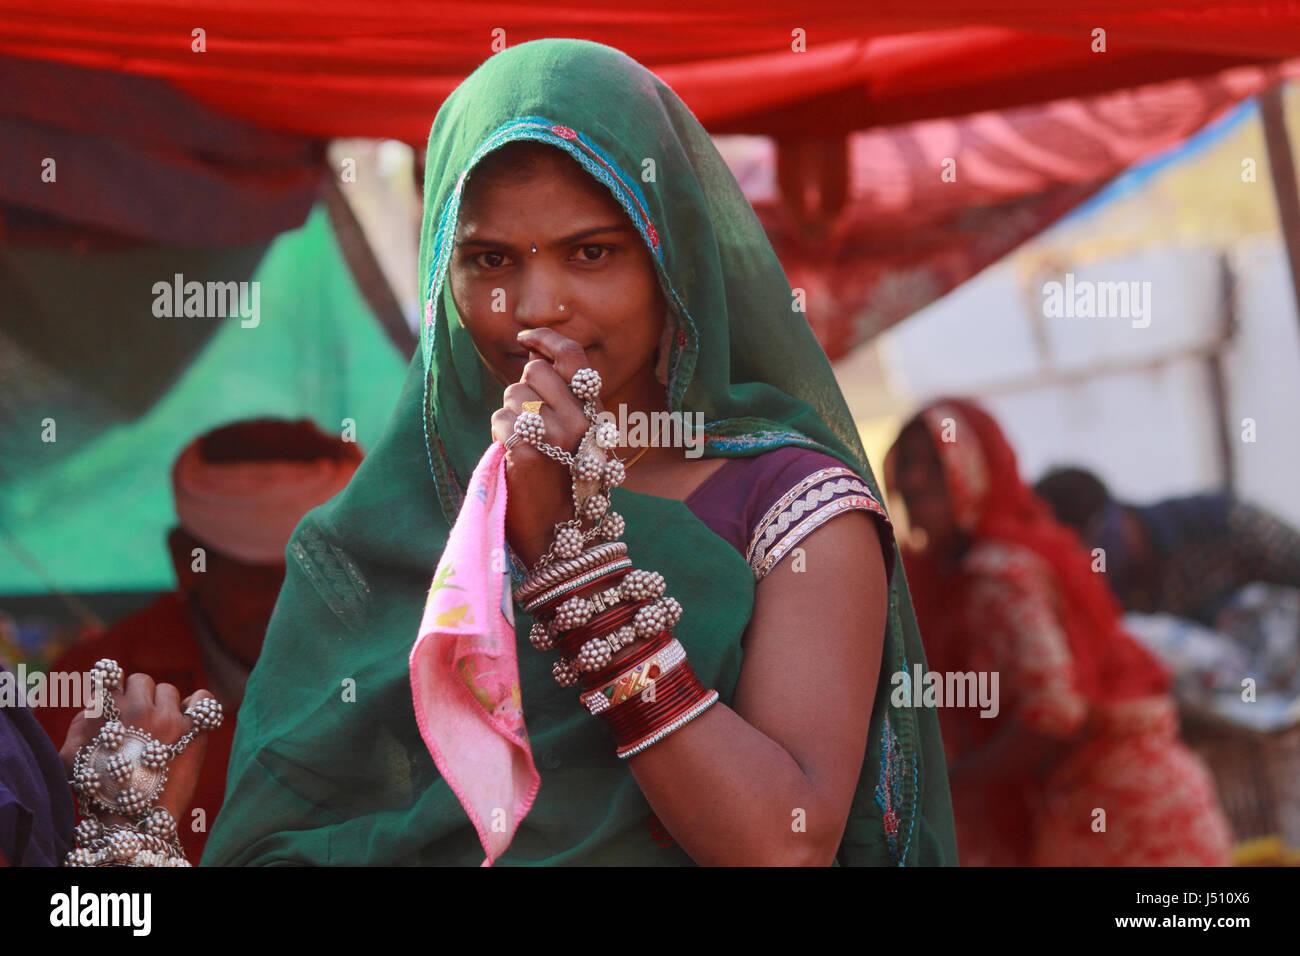 Woman in traditional attire. Kawant Festival, Gujarat, India - Stock Image